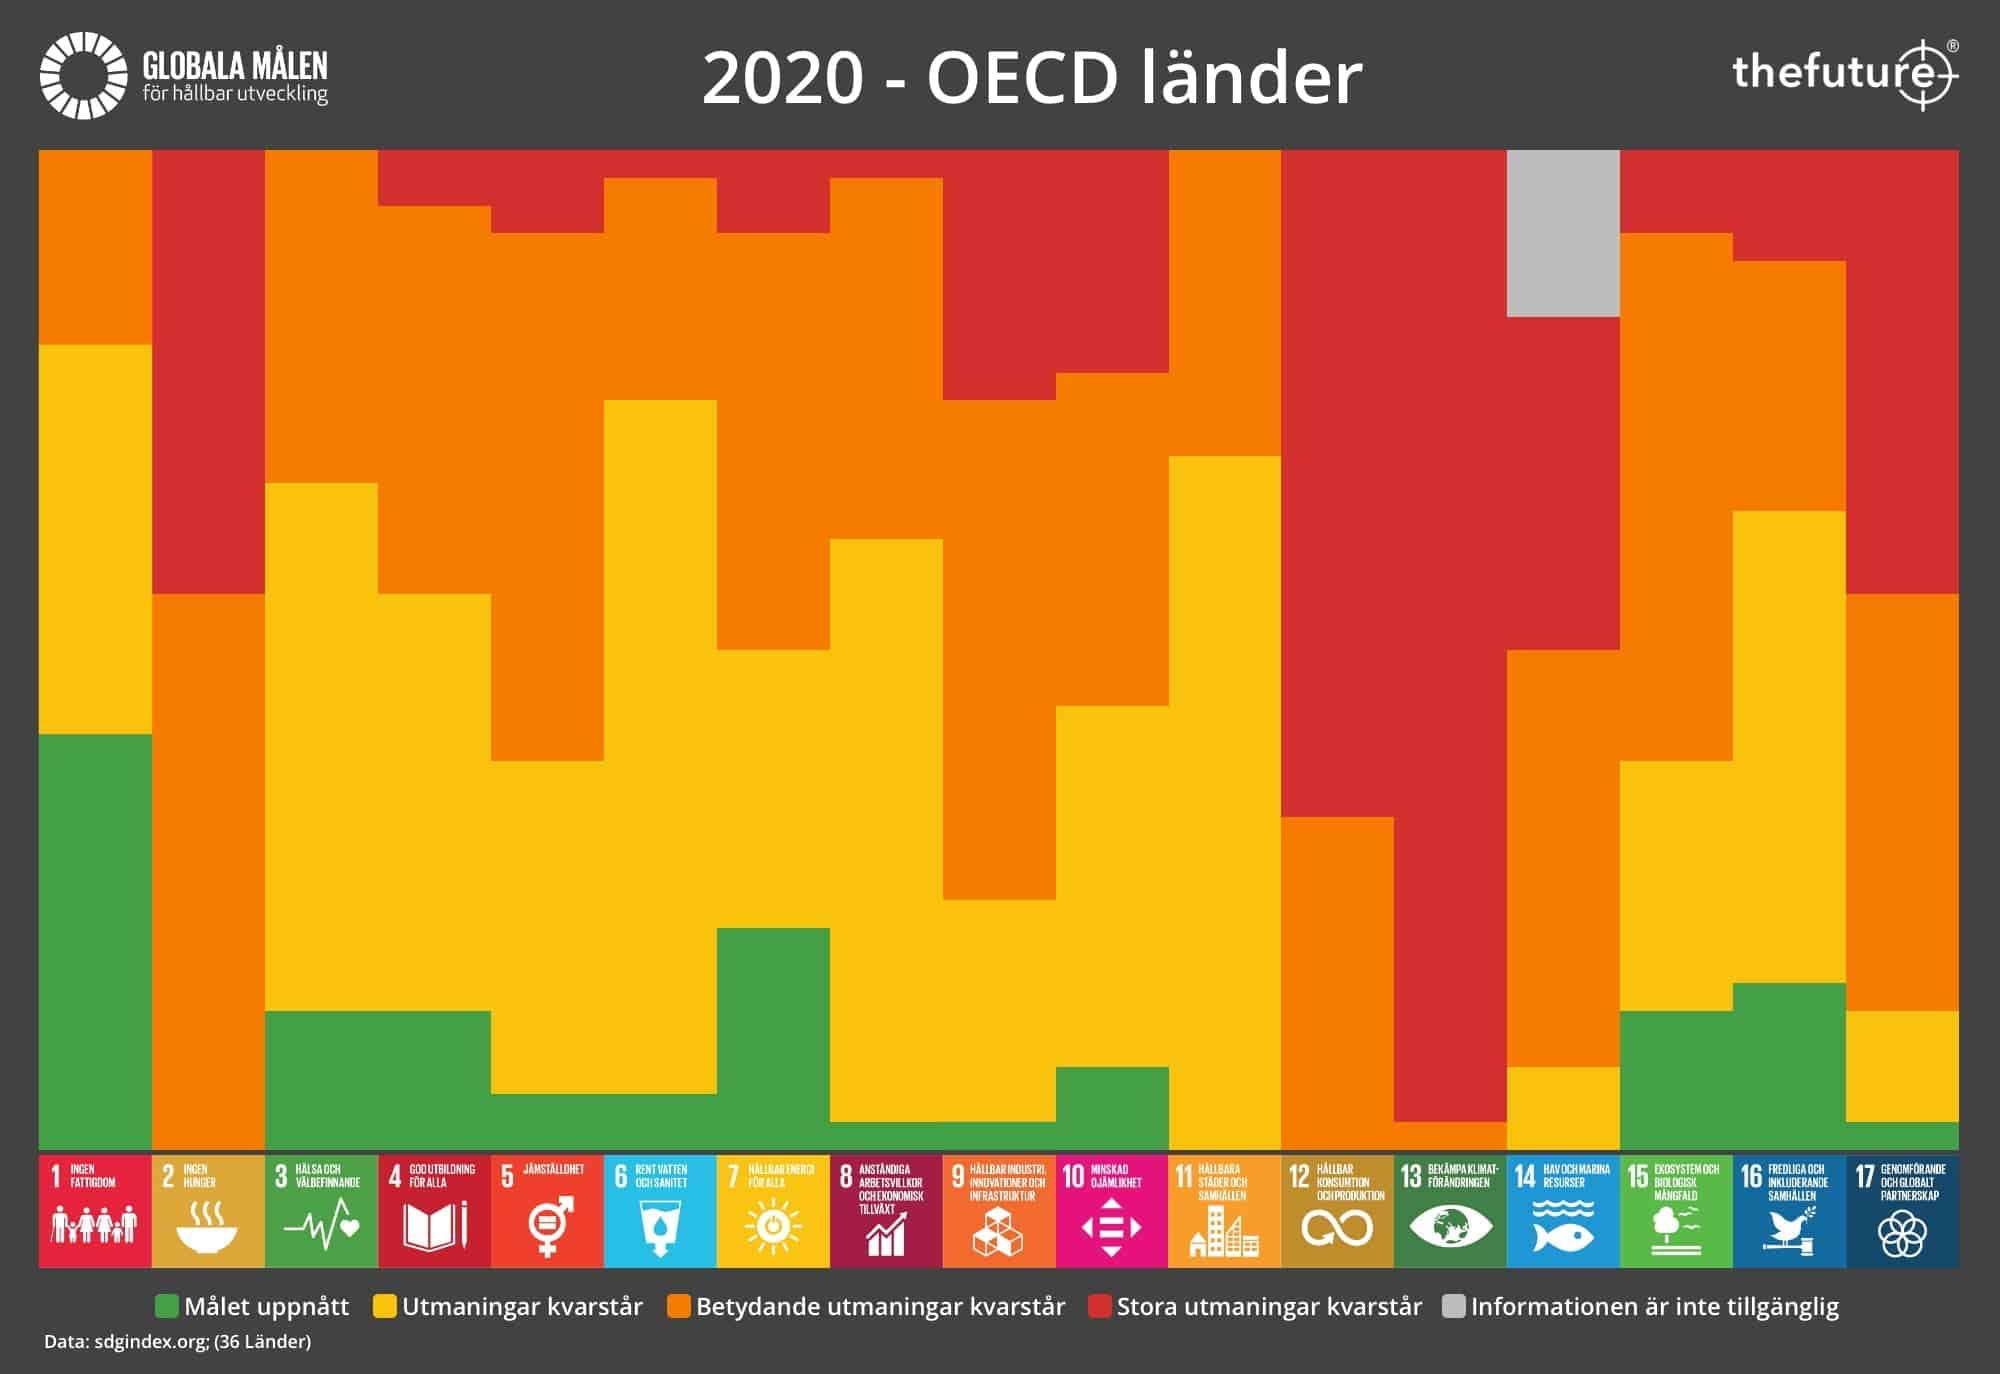 thefuture, blogg, SDG-Progress-2020-OECD